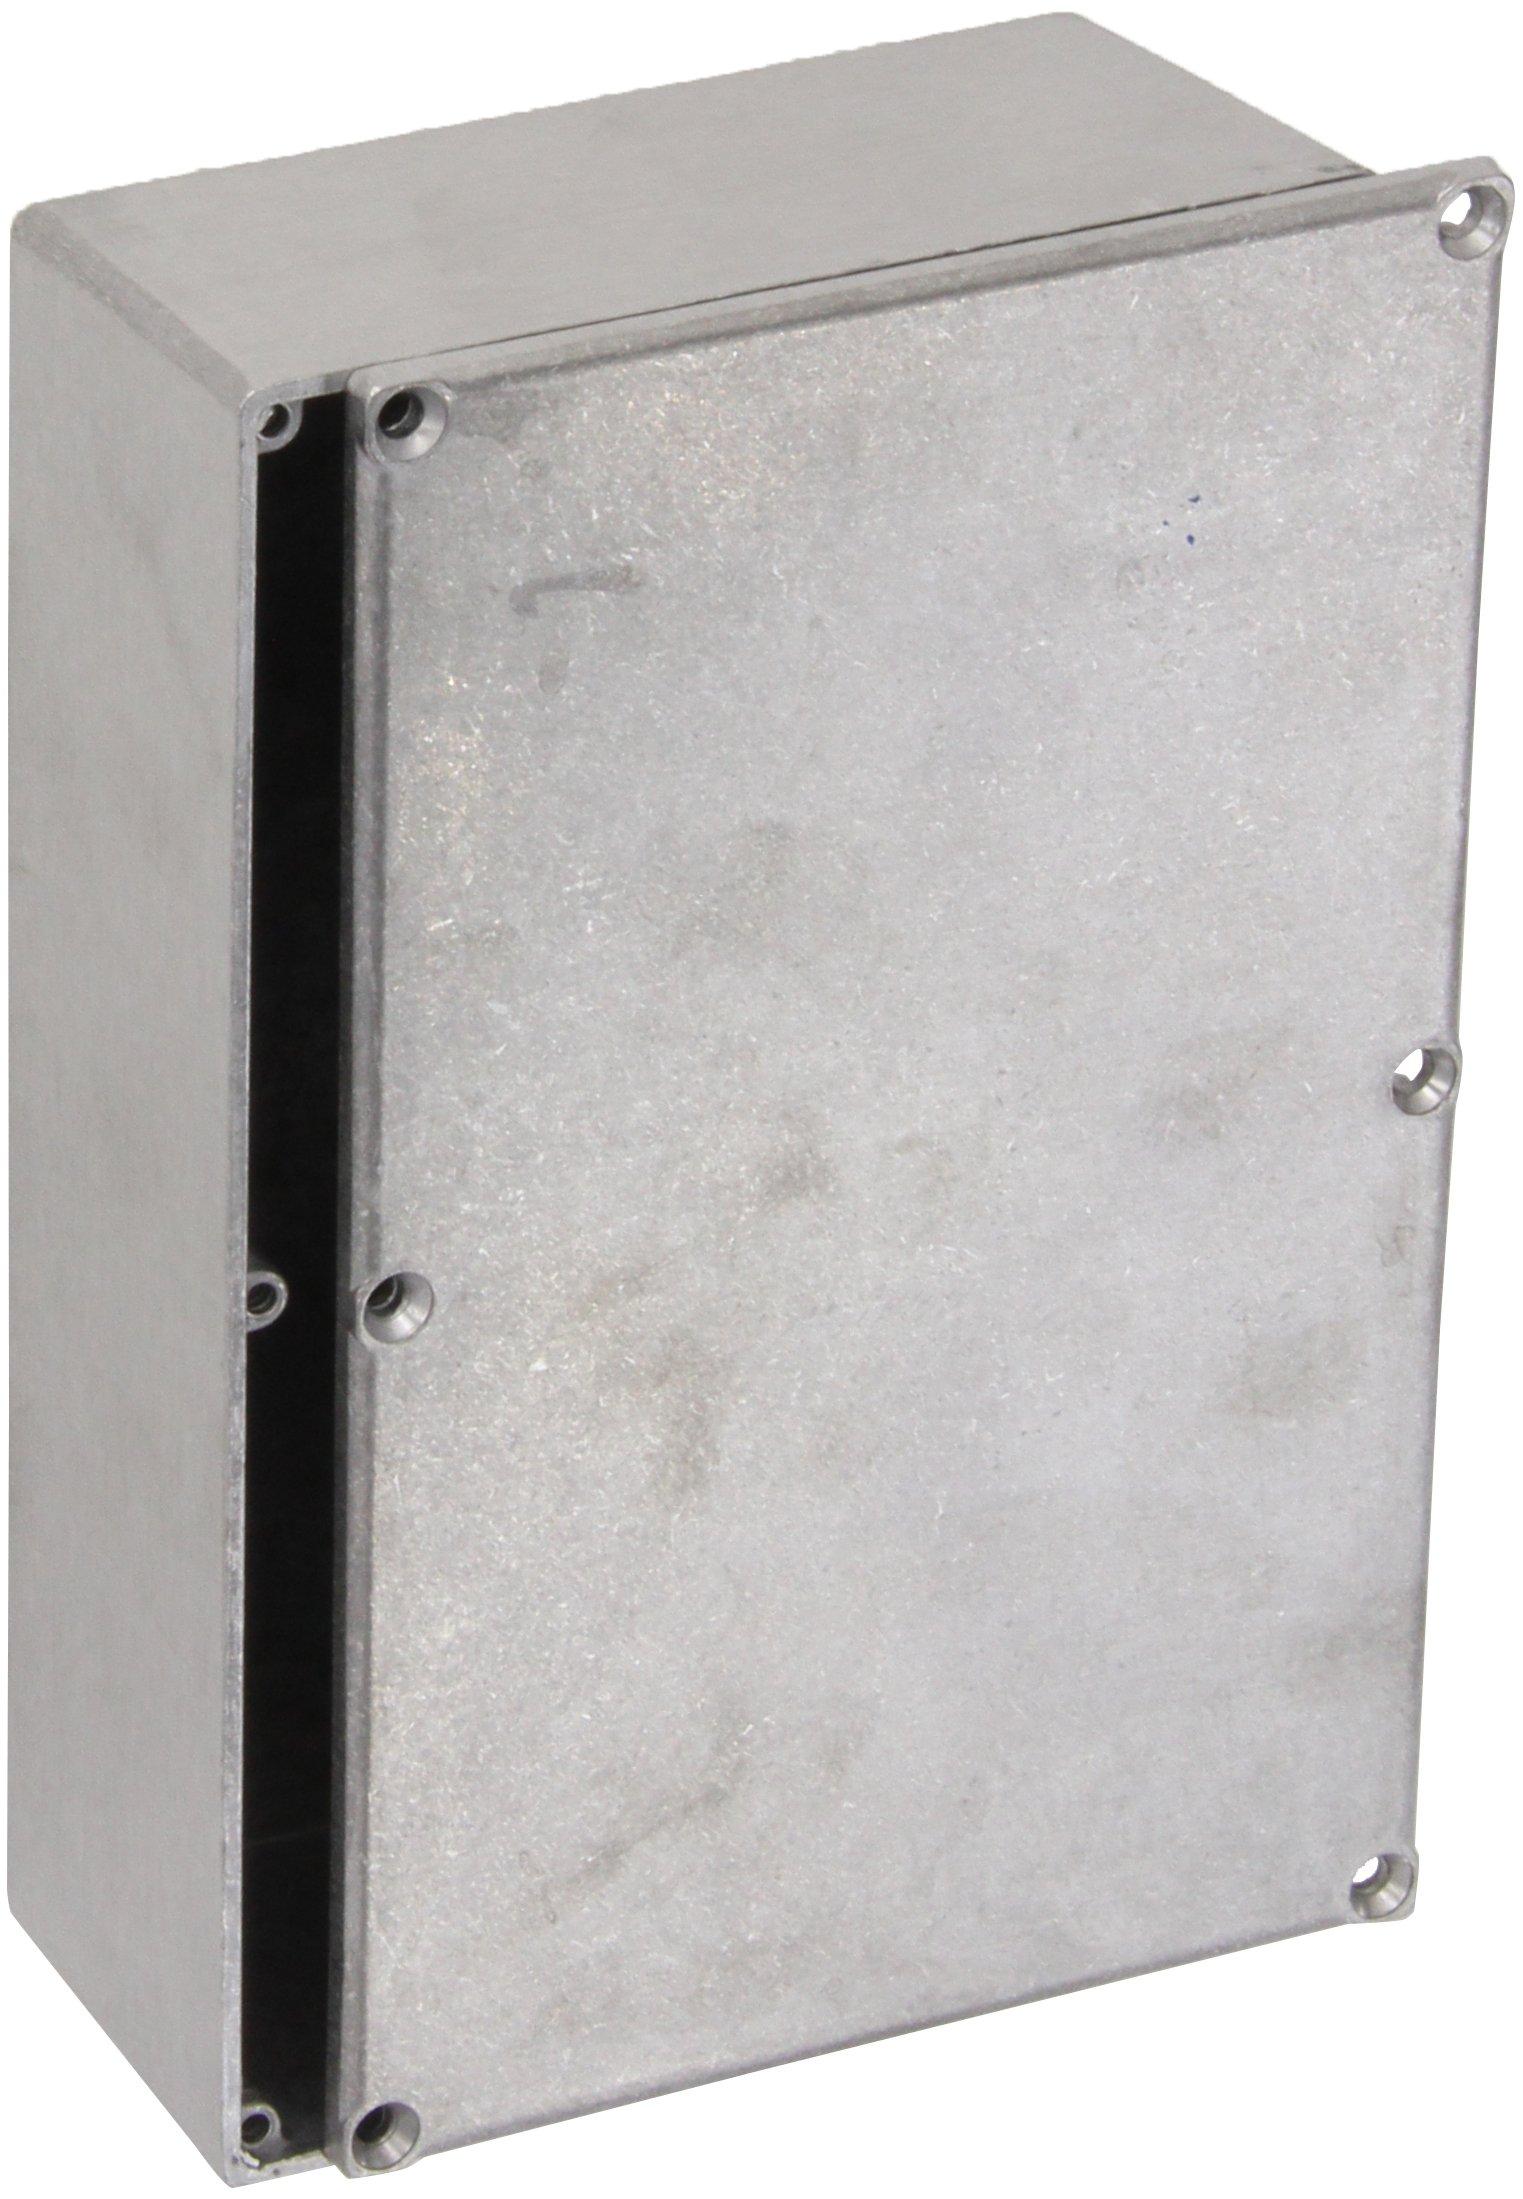 BUD Industries CU-247 Aluminum Econobox, 7-3/8'' Length x 4-11/16'' Width x 2-13/64'' Height, Natural Finish